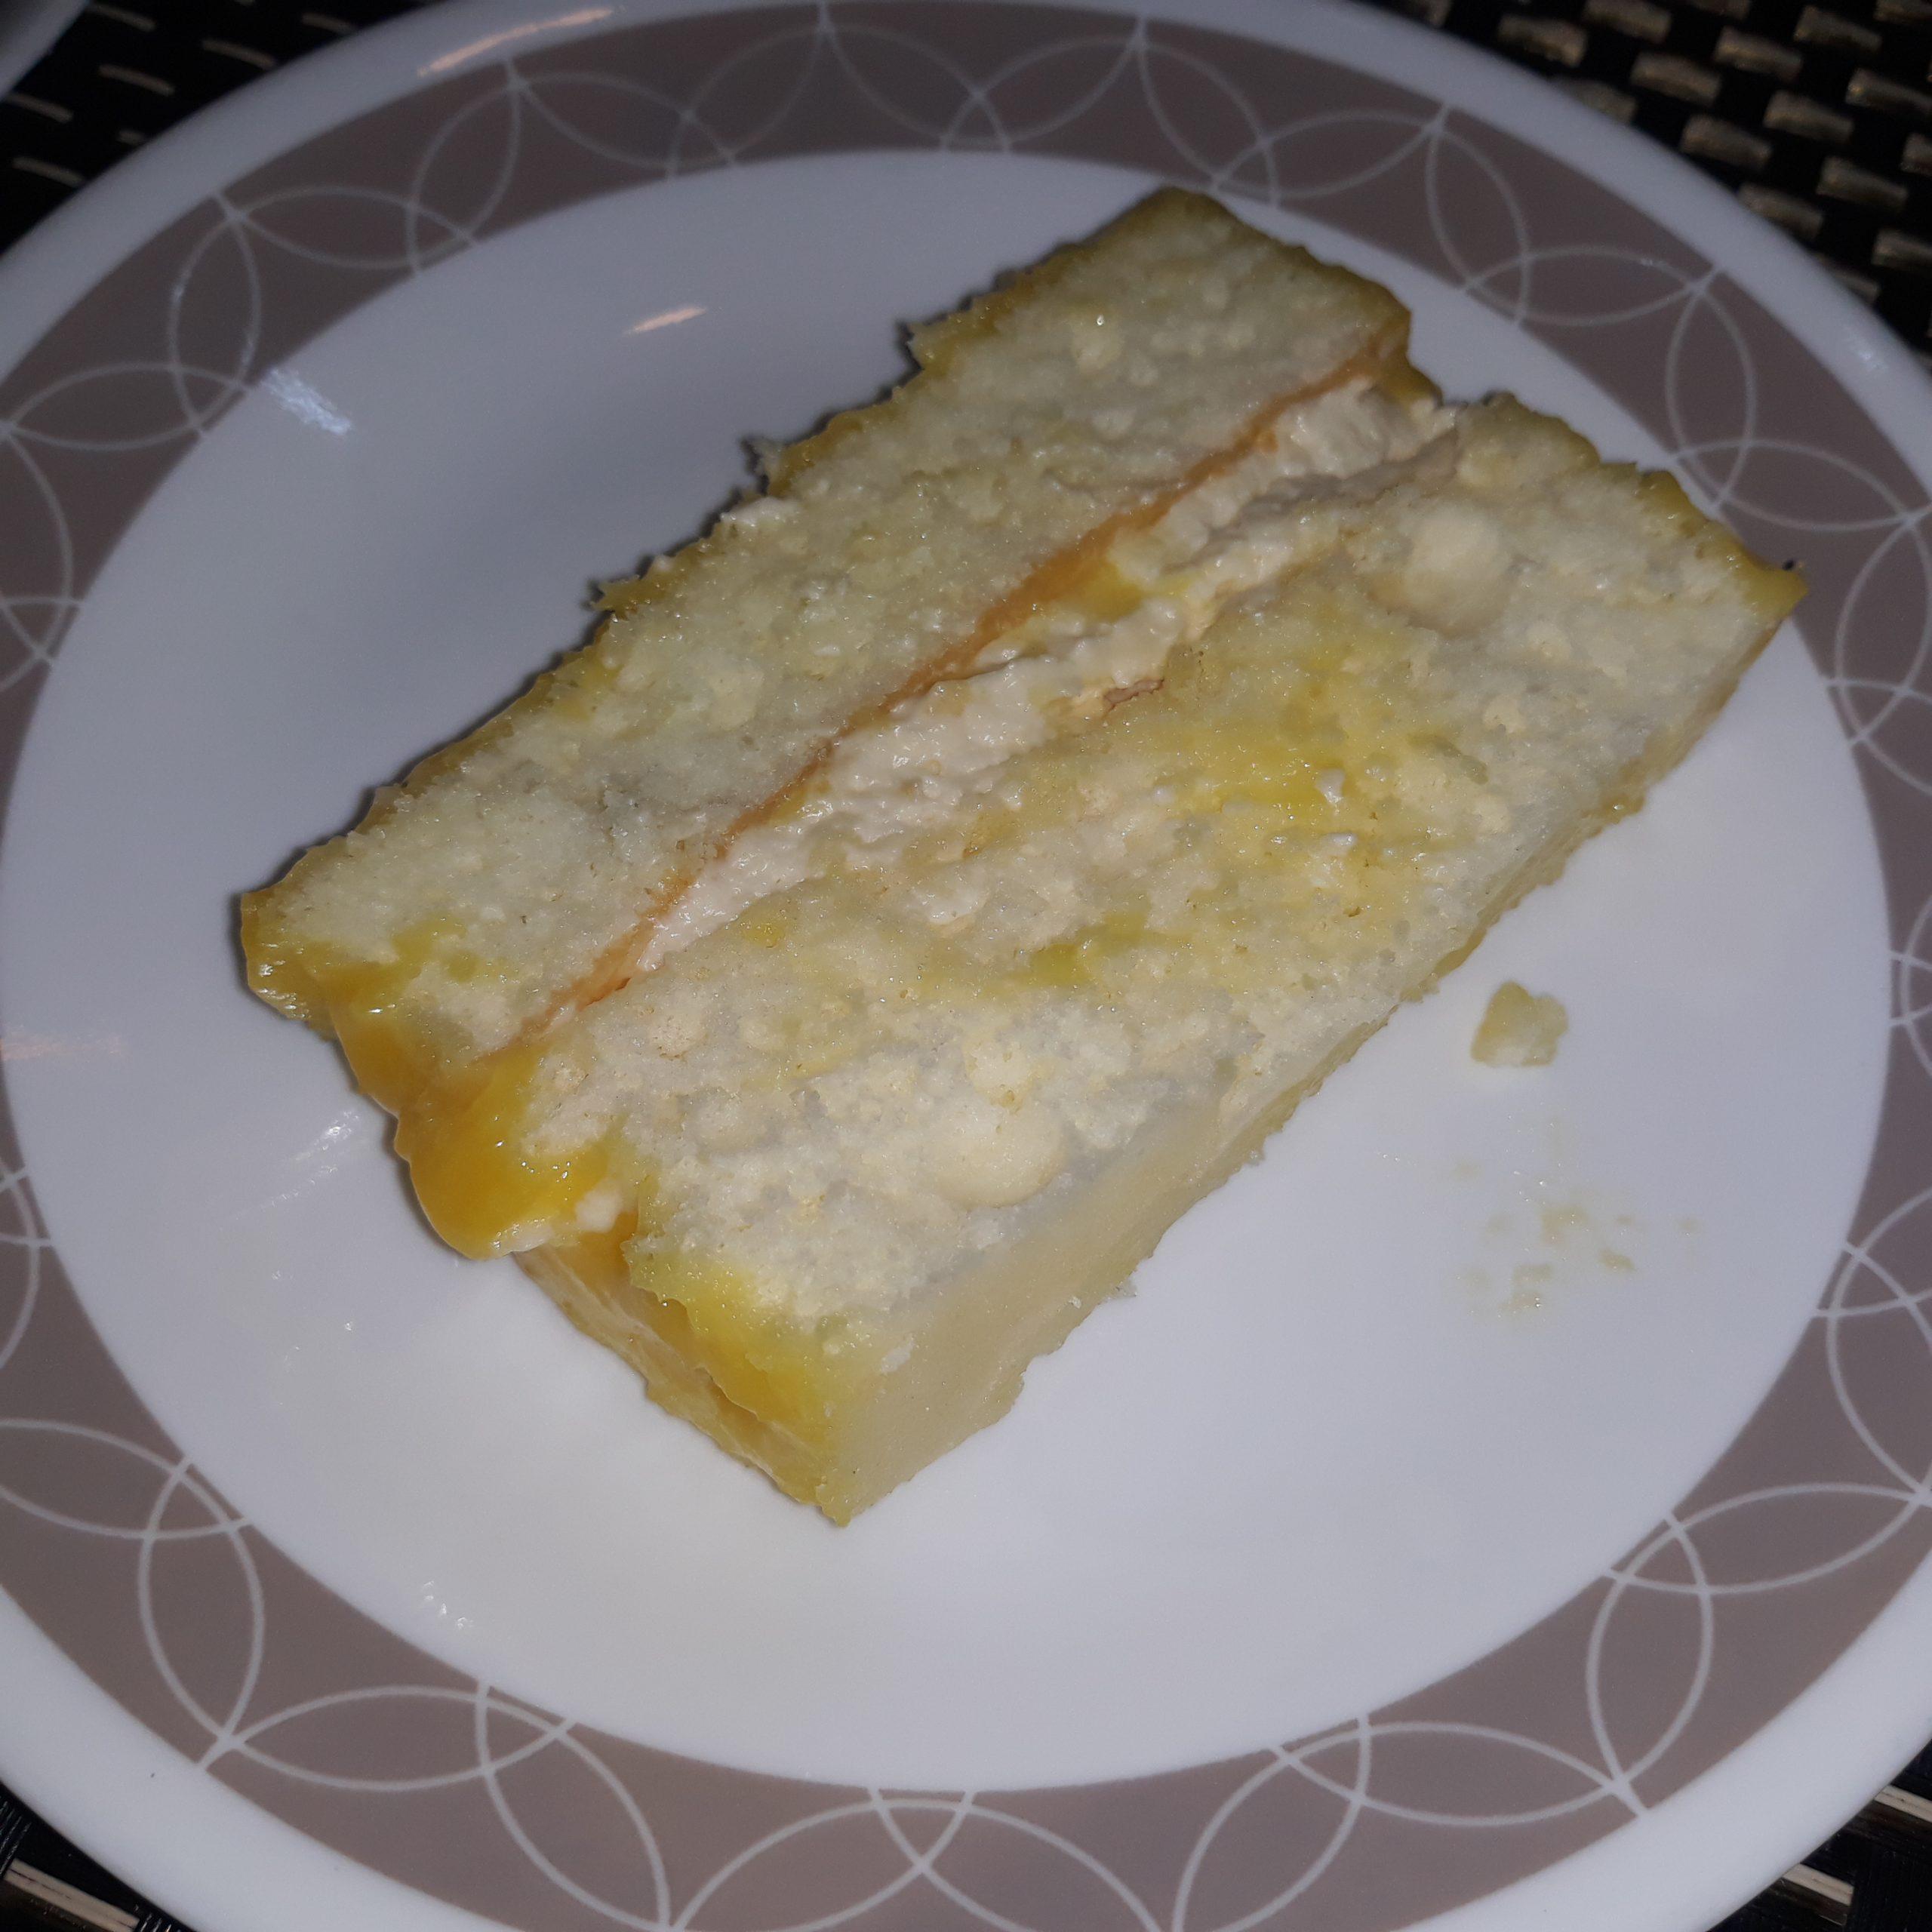 A slice of yema cake on a white plate.